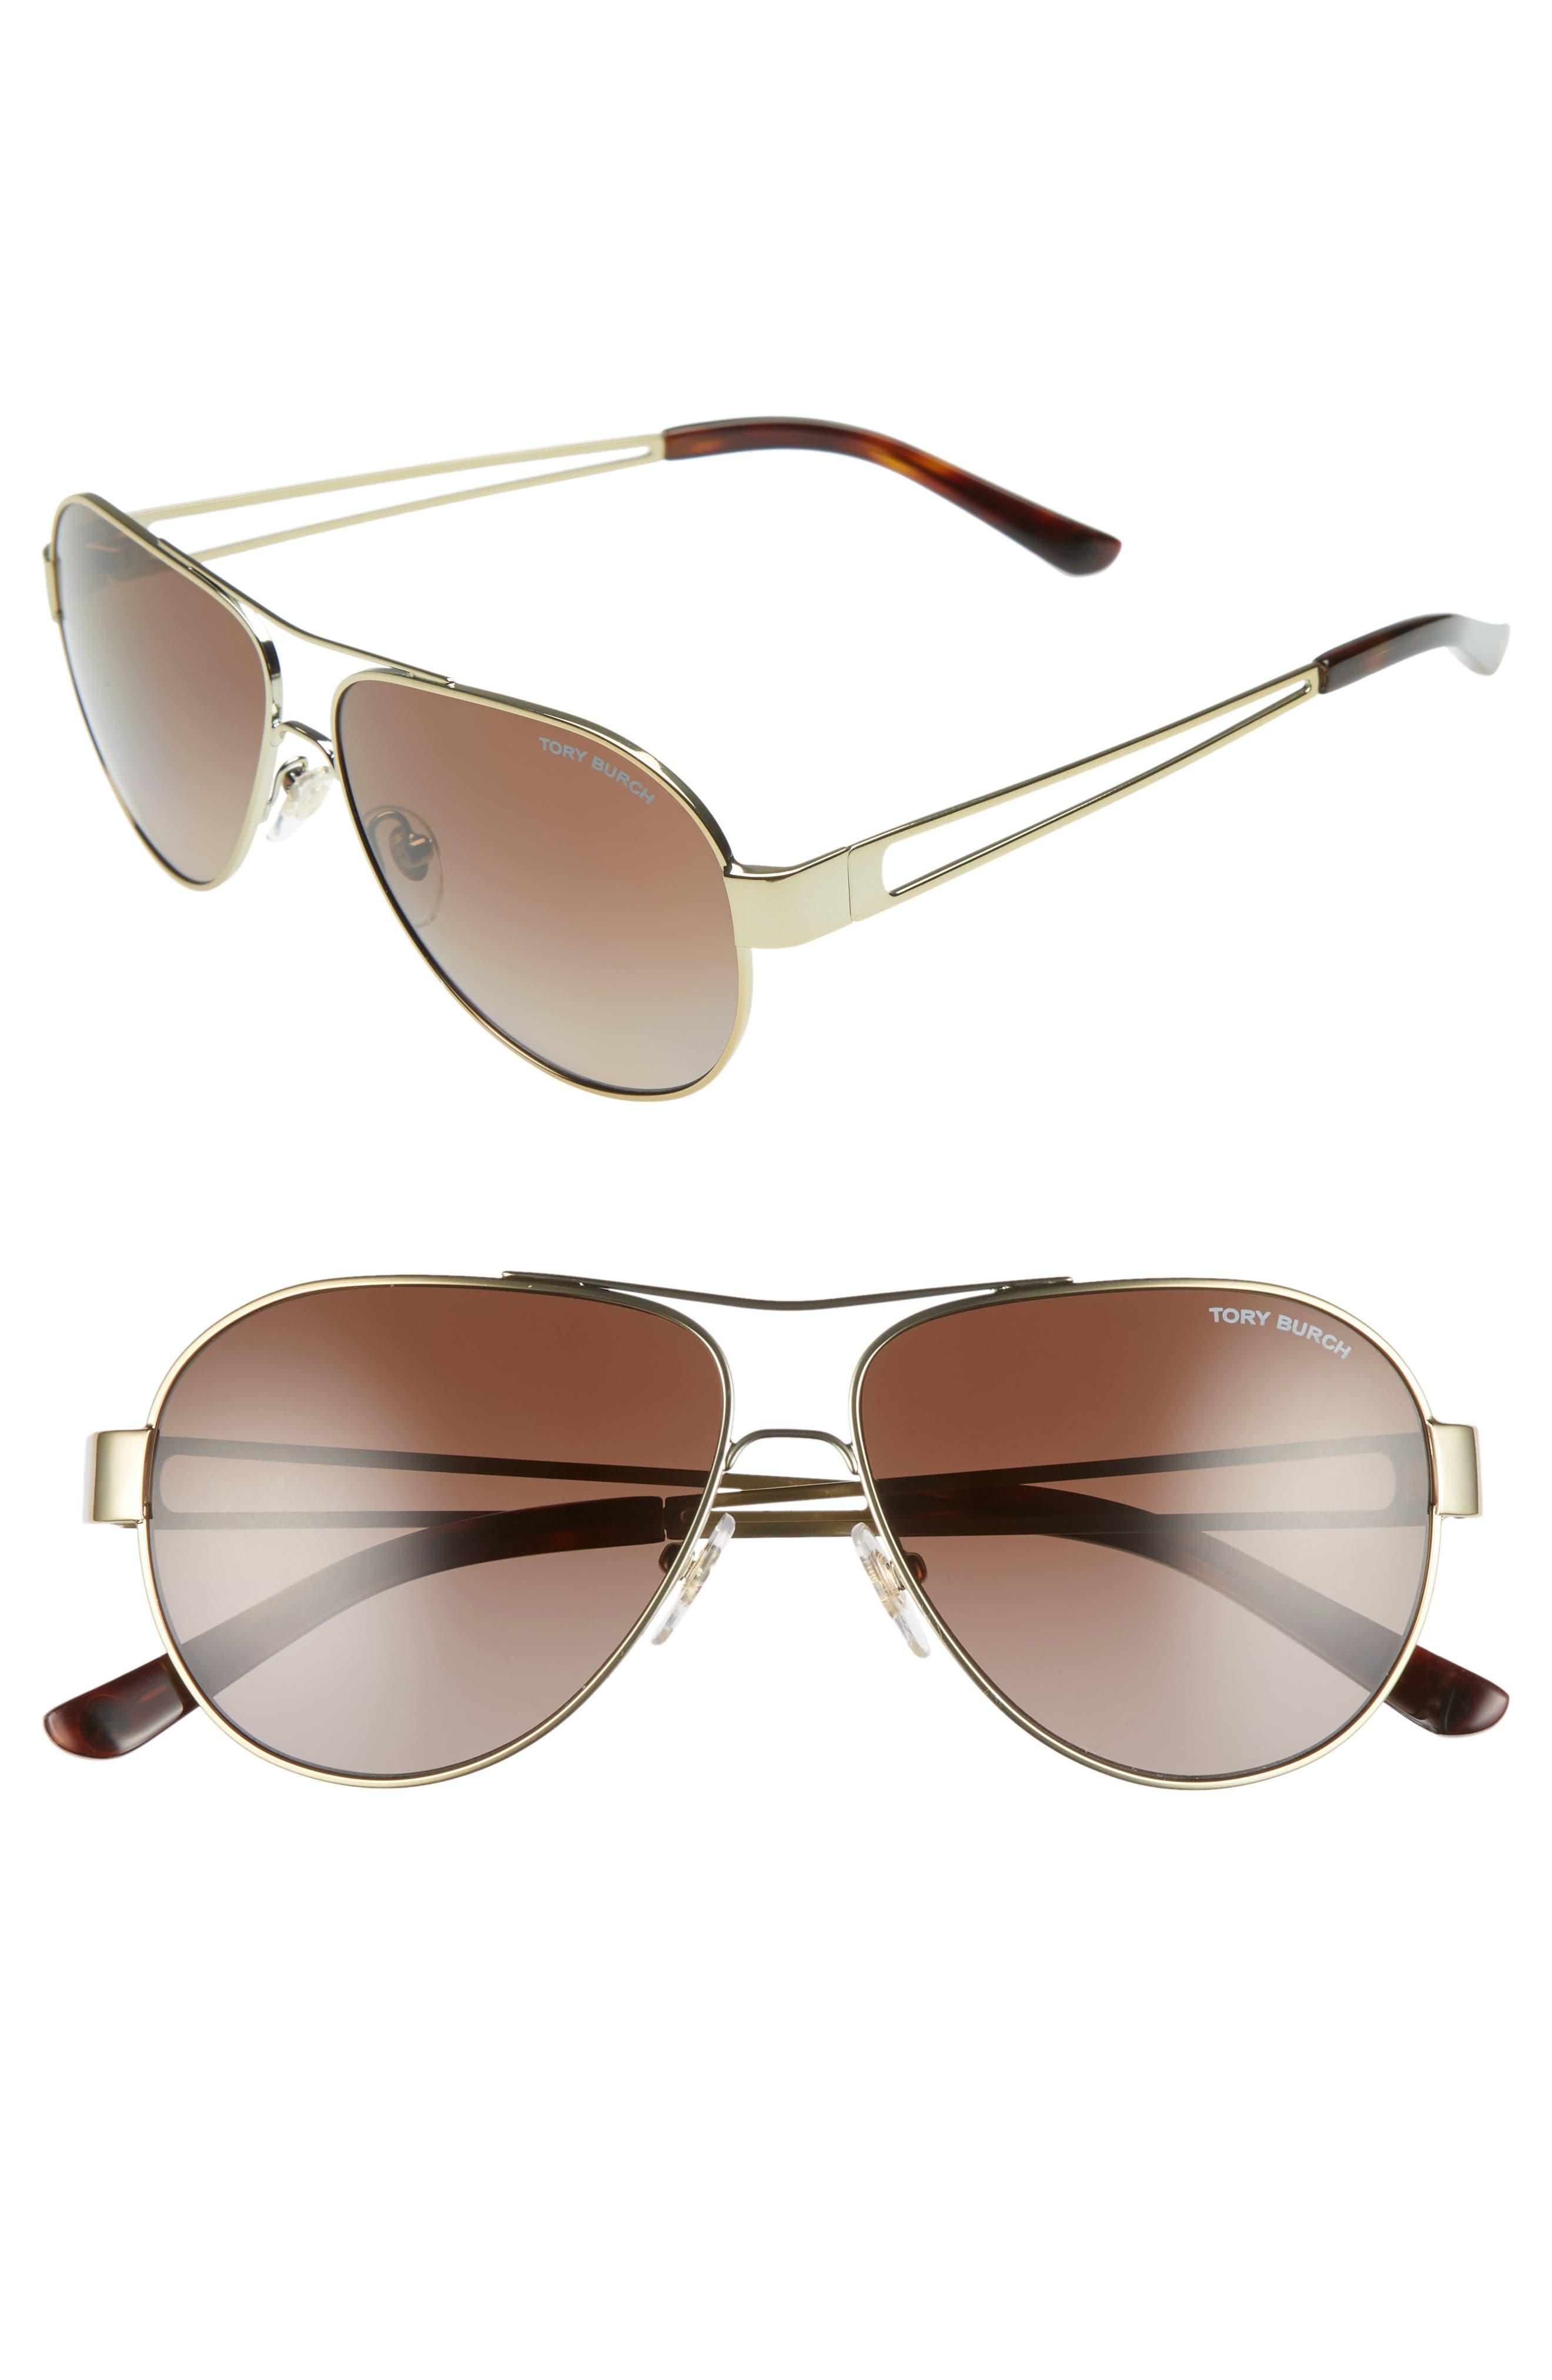 72c3442acdda2 Tory Burch Sunglasses